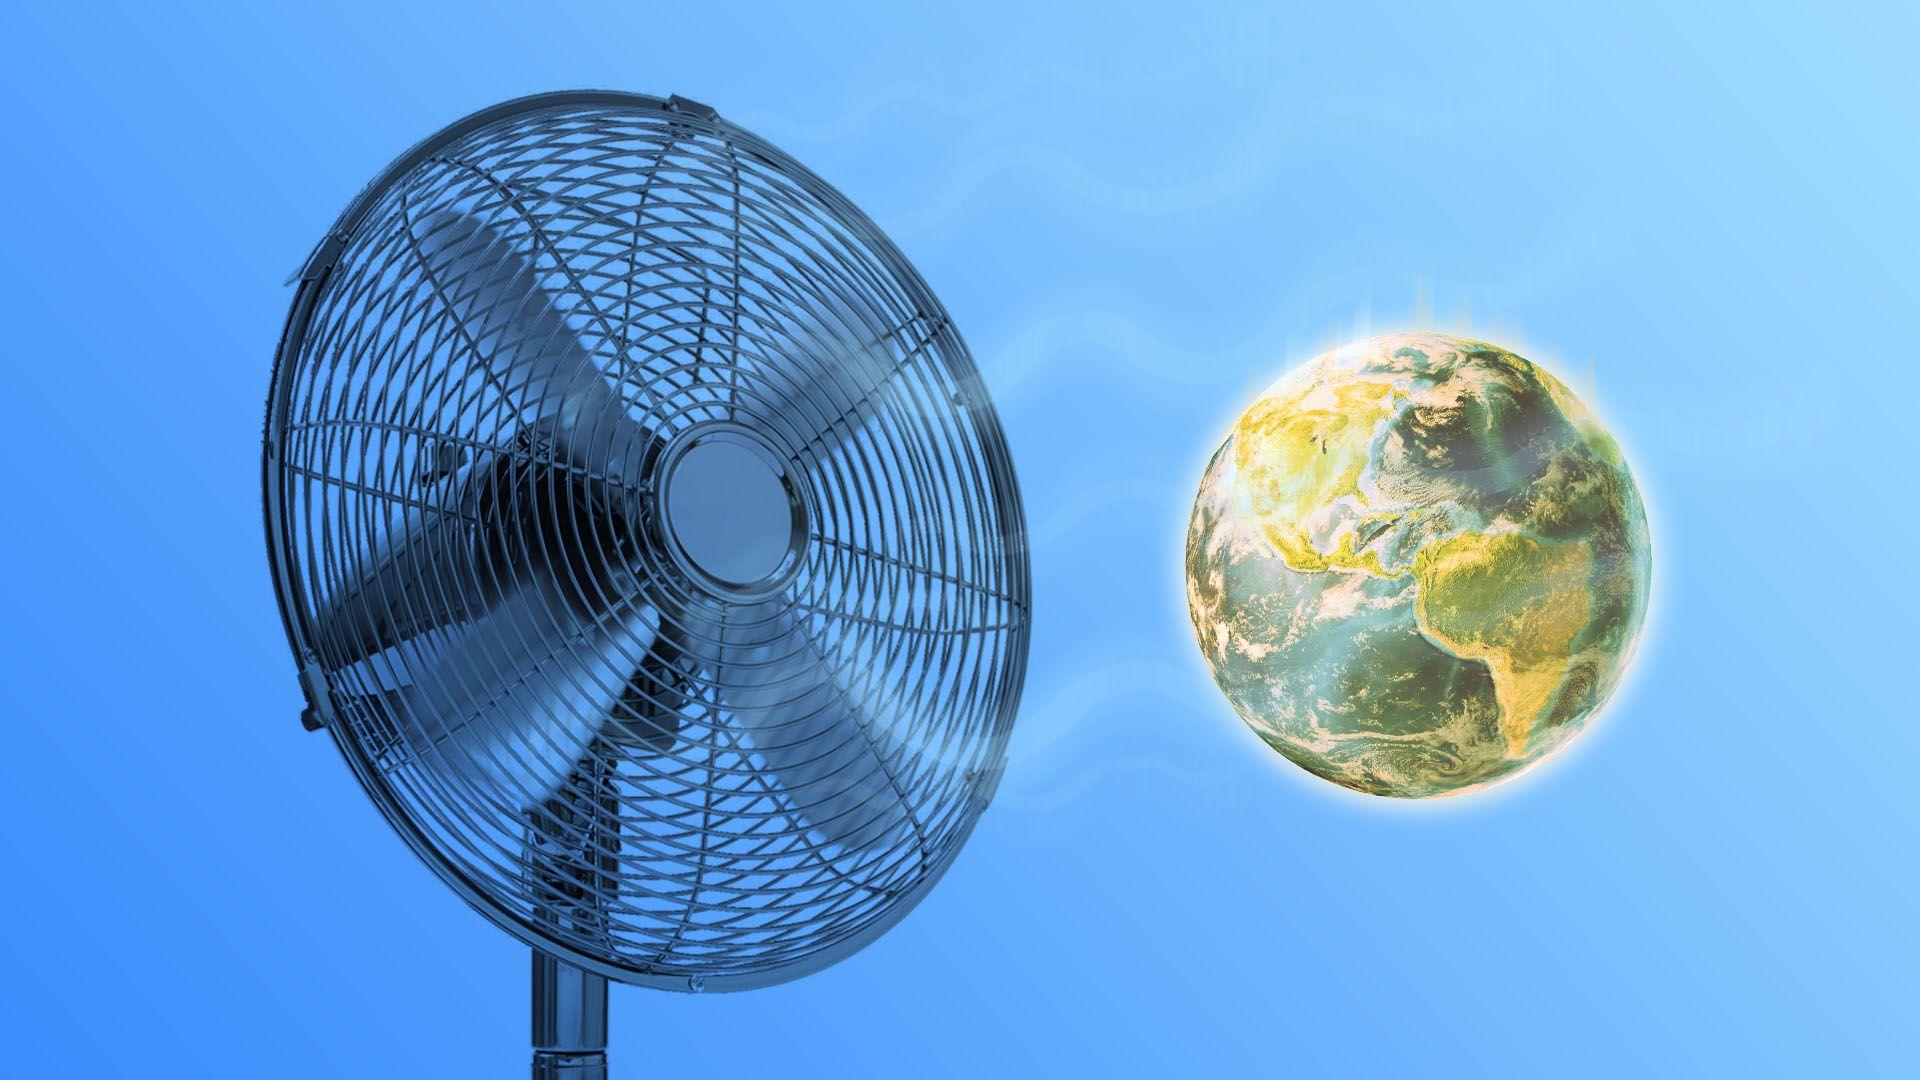 A fan blowing on Earth to cool it down